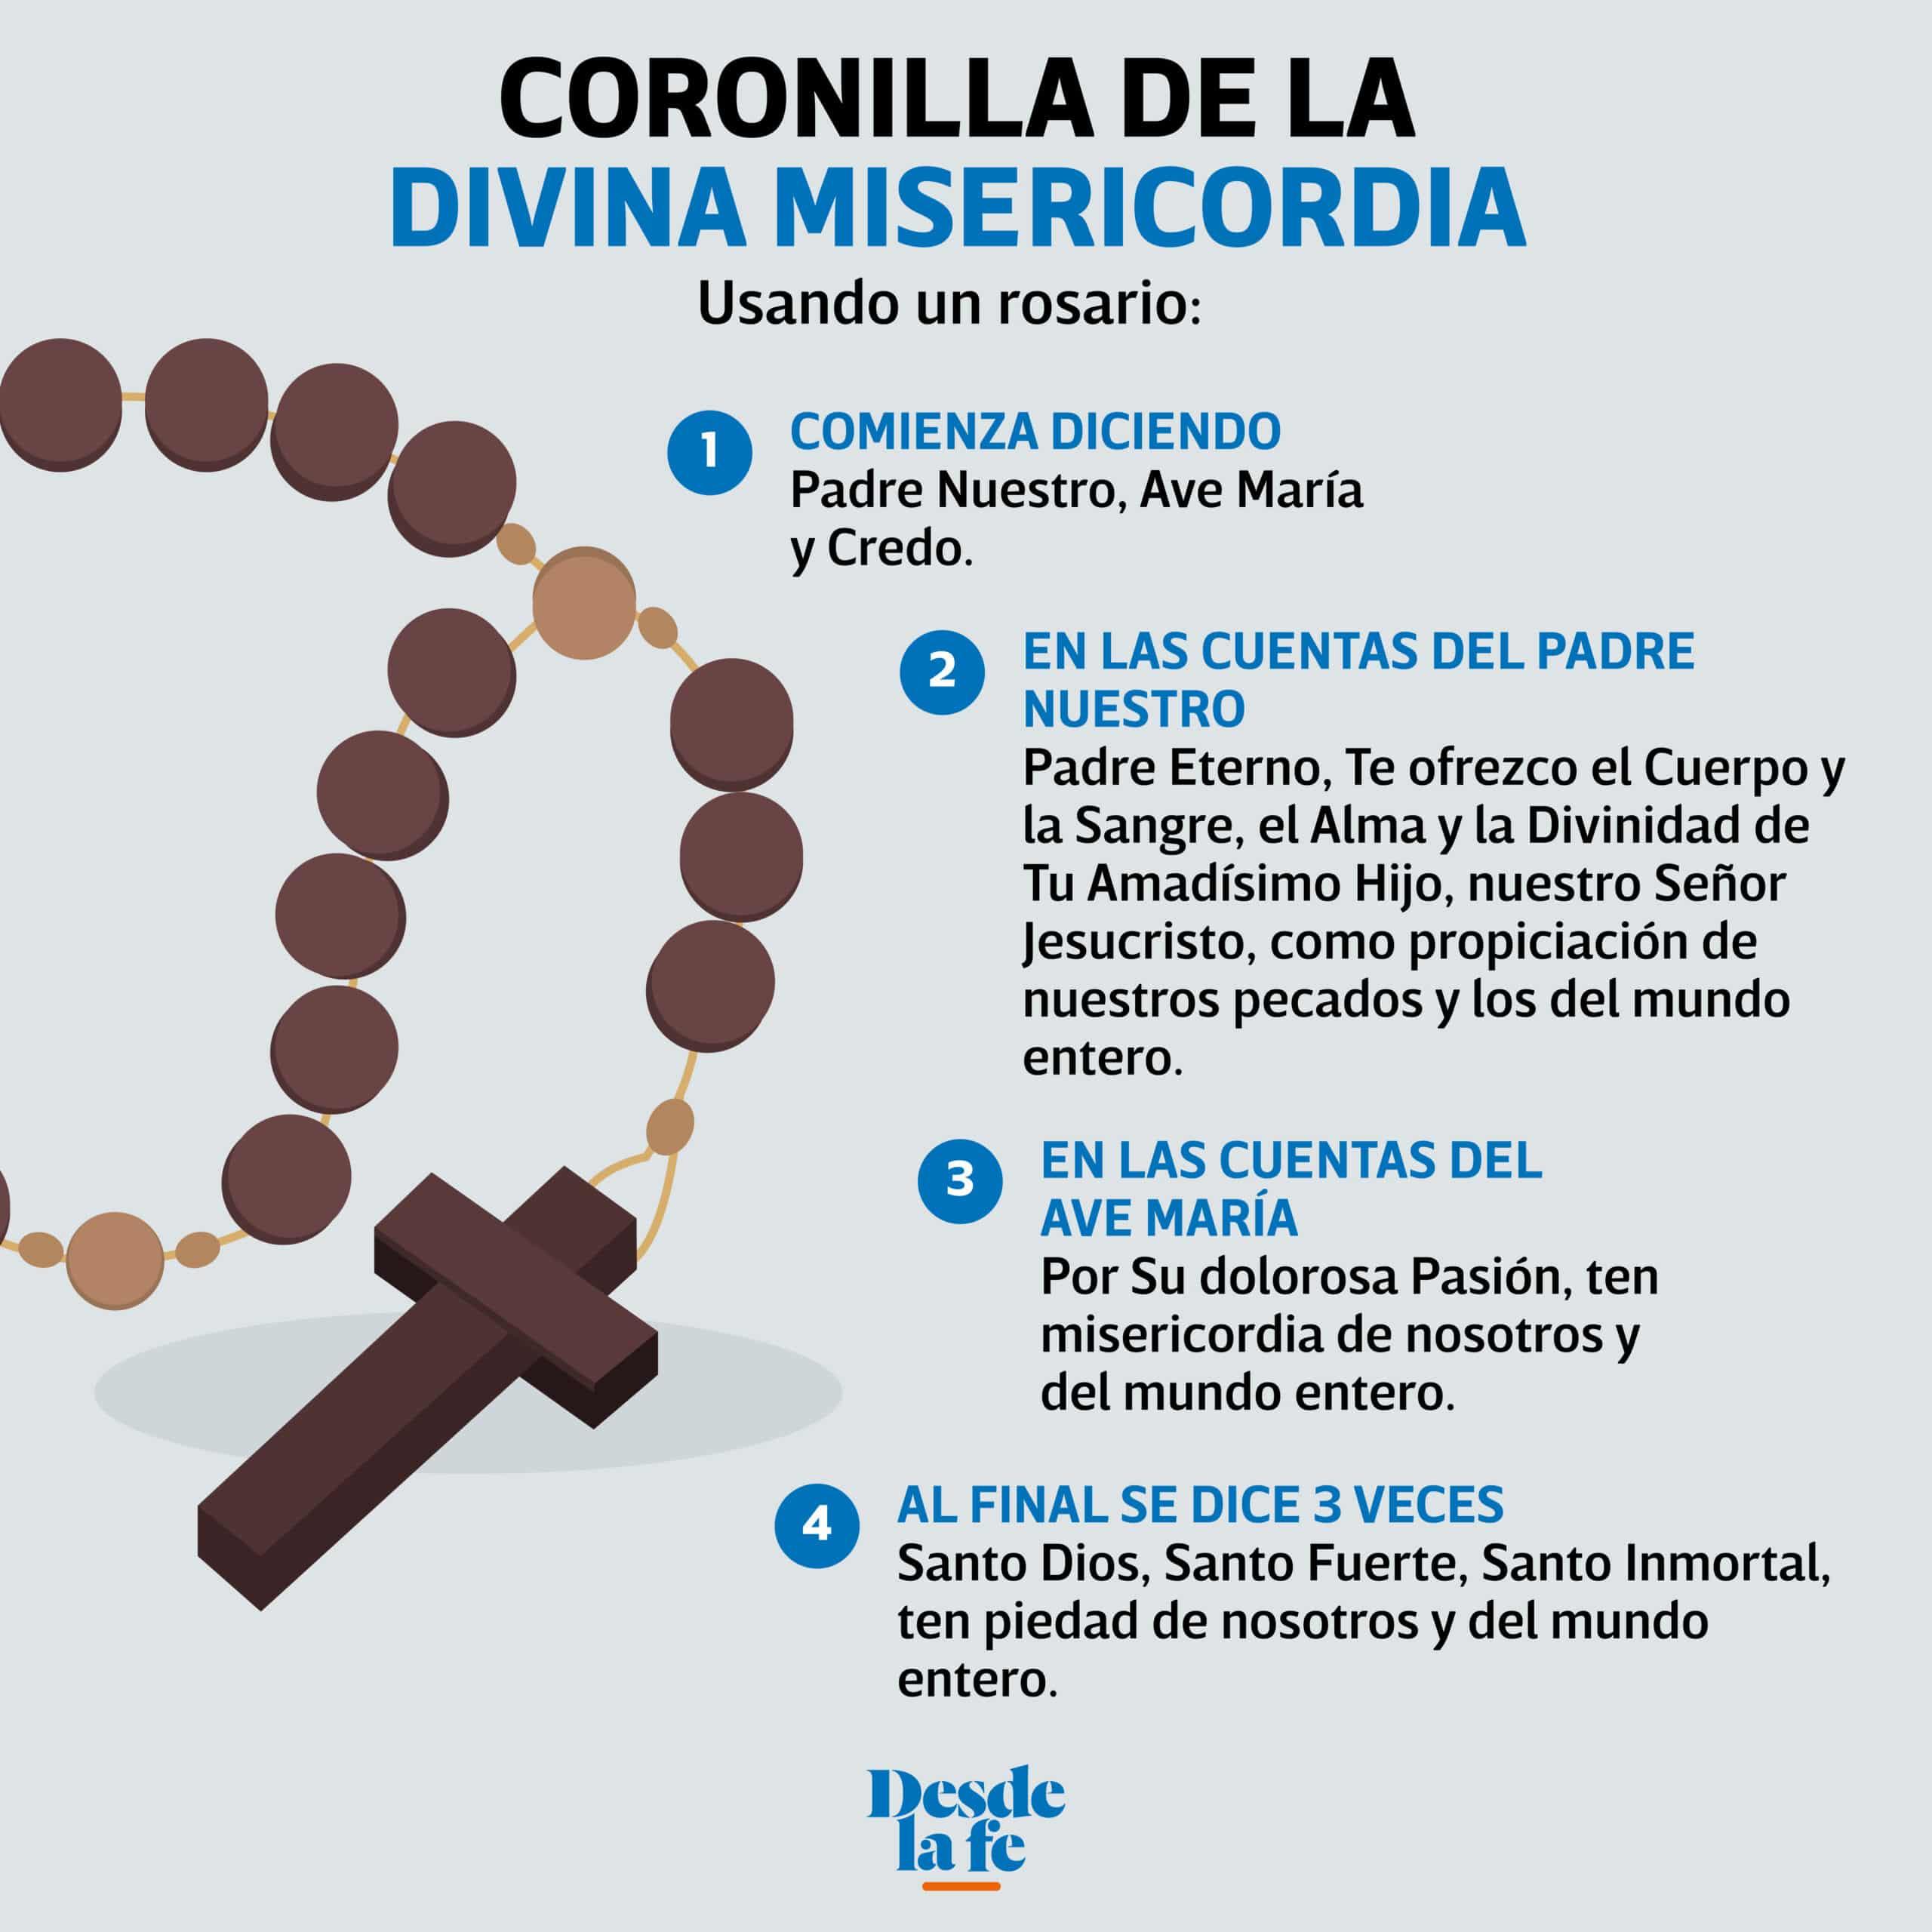 Coronilla De La Divina Misericordia Cómo Rezar La Coronilla Paso A Paso